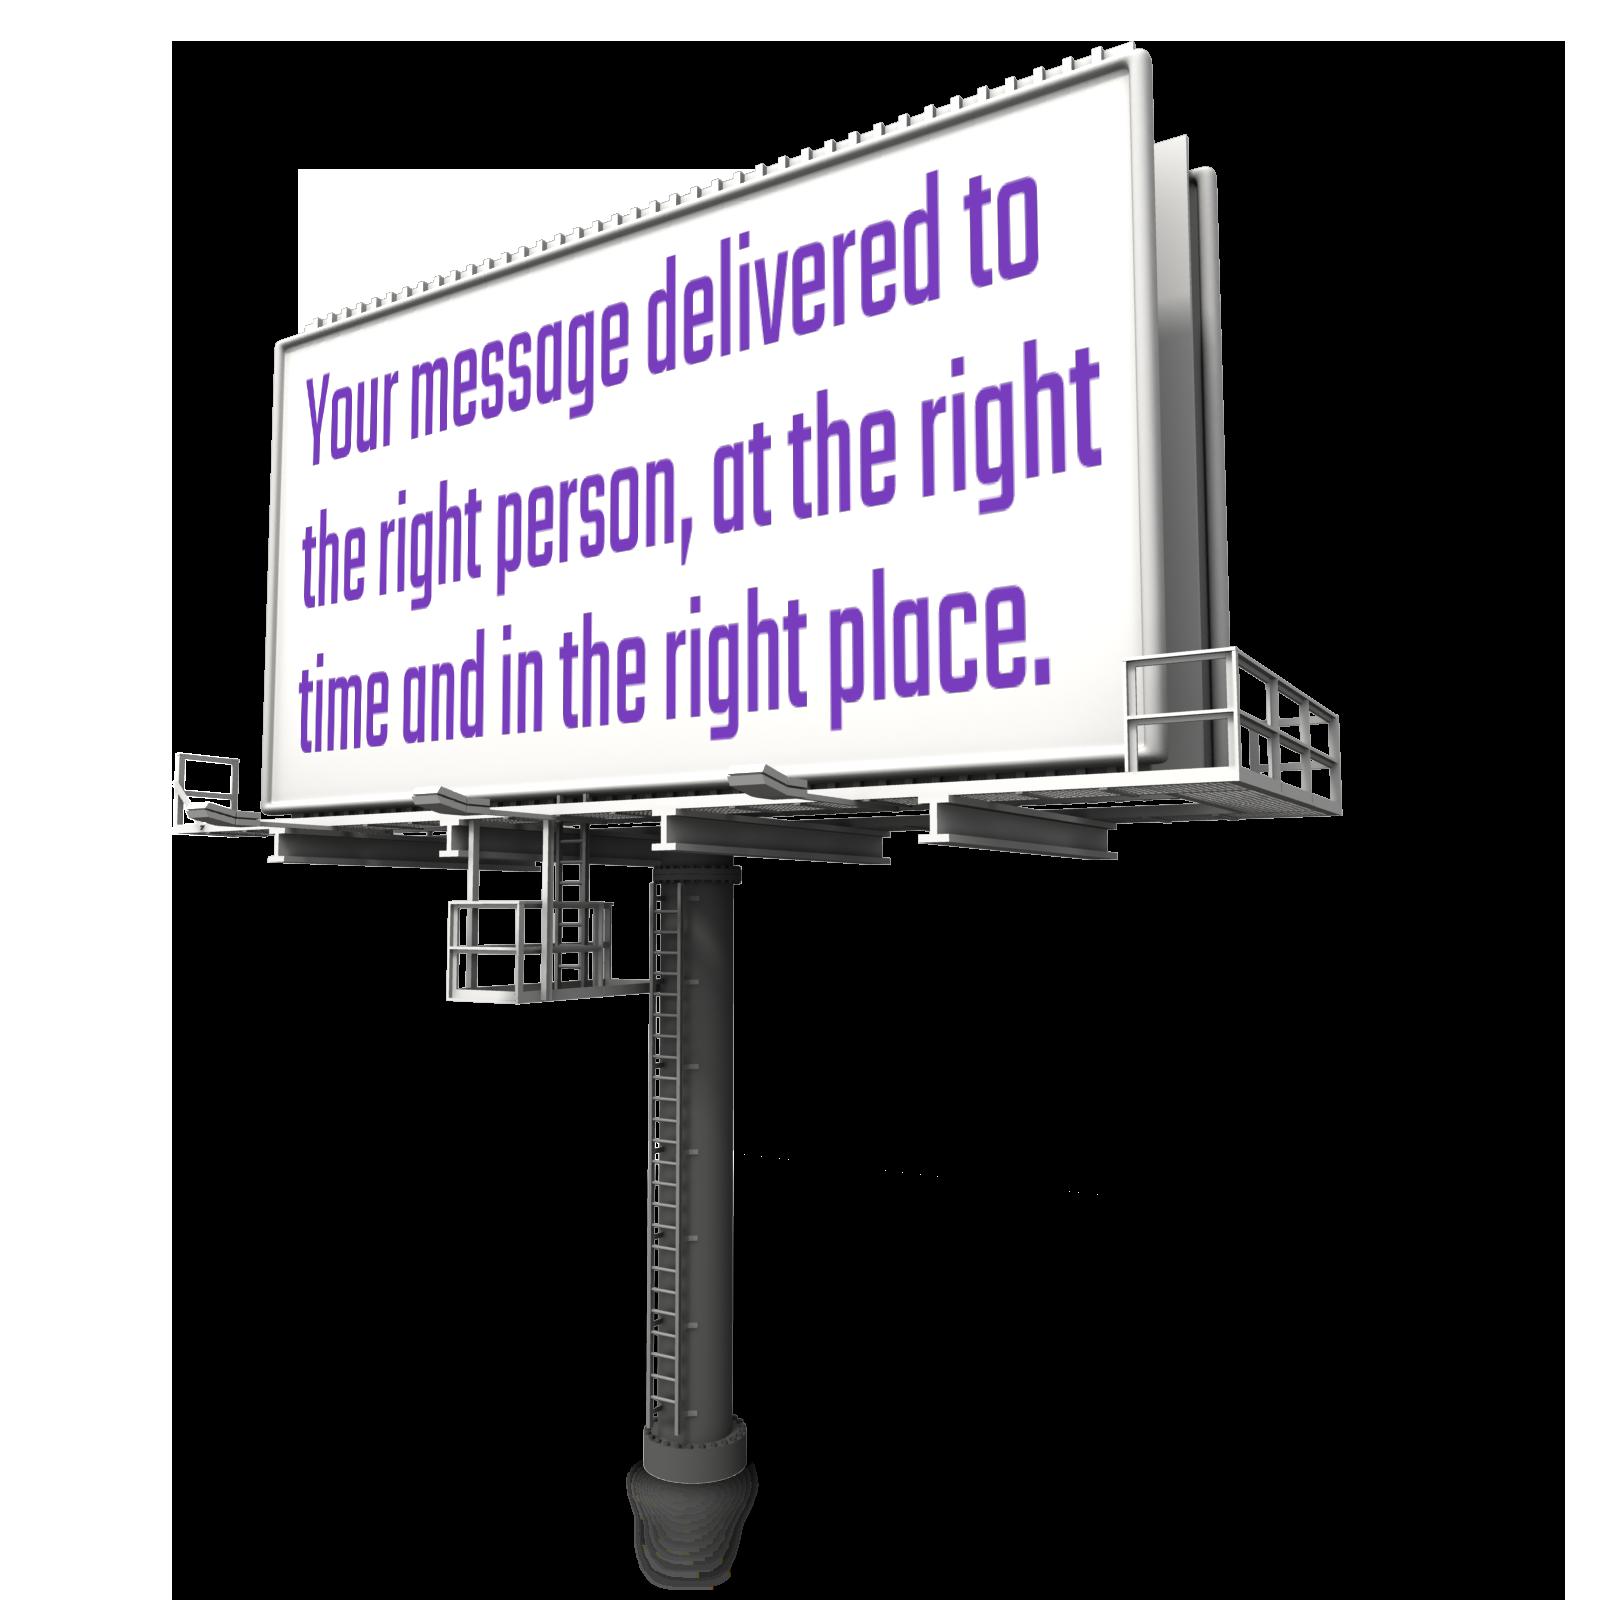 advertising services miami